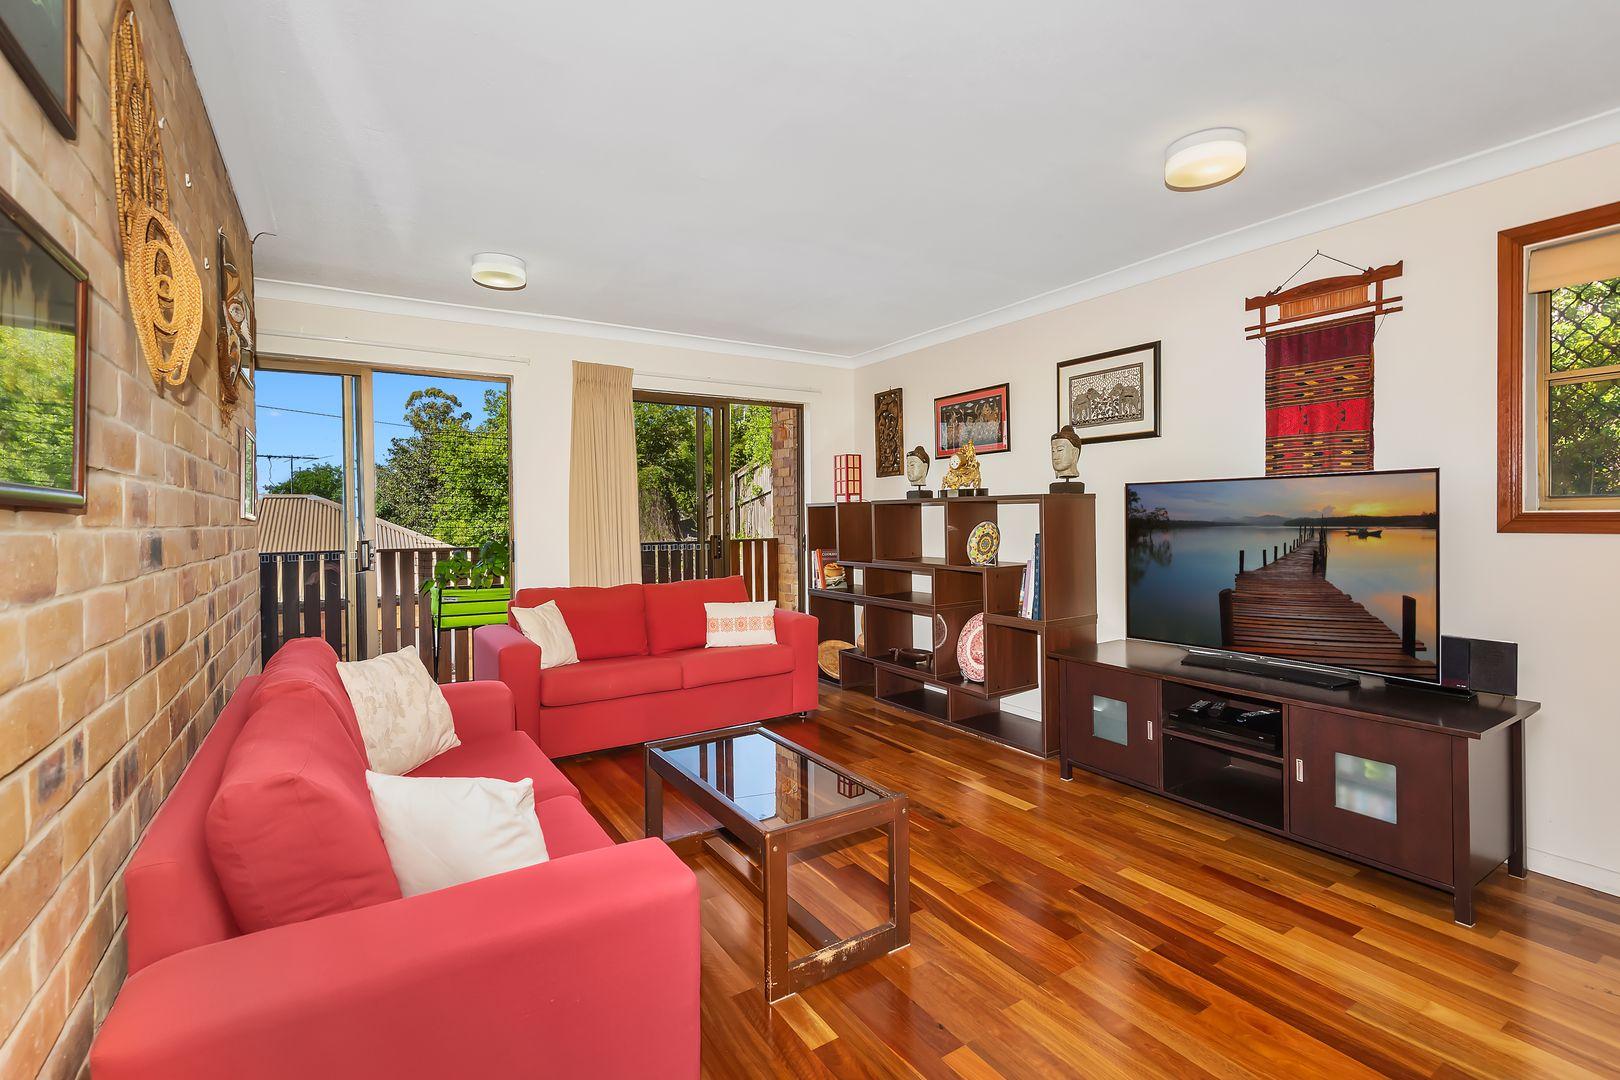 15/18 Seal Street, Paddington QLD 4064, Image 1